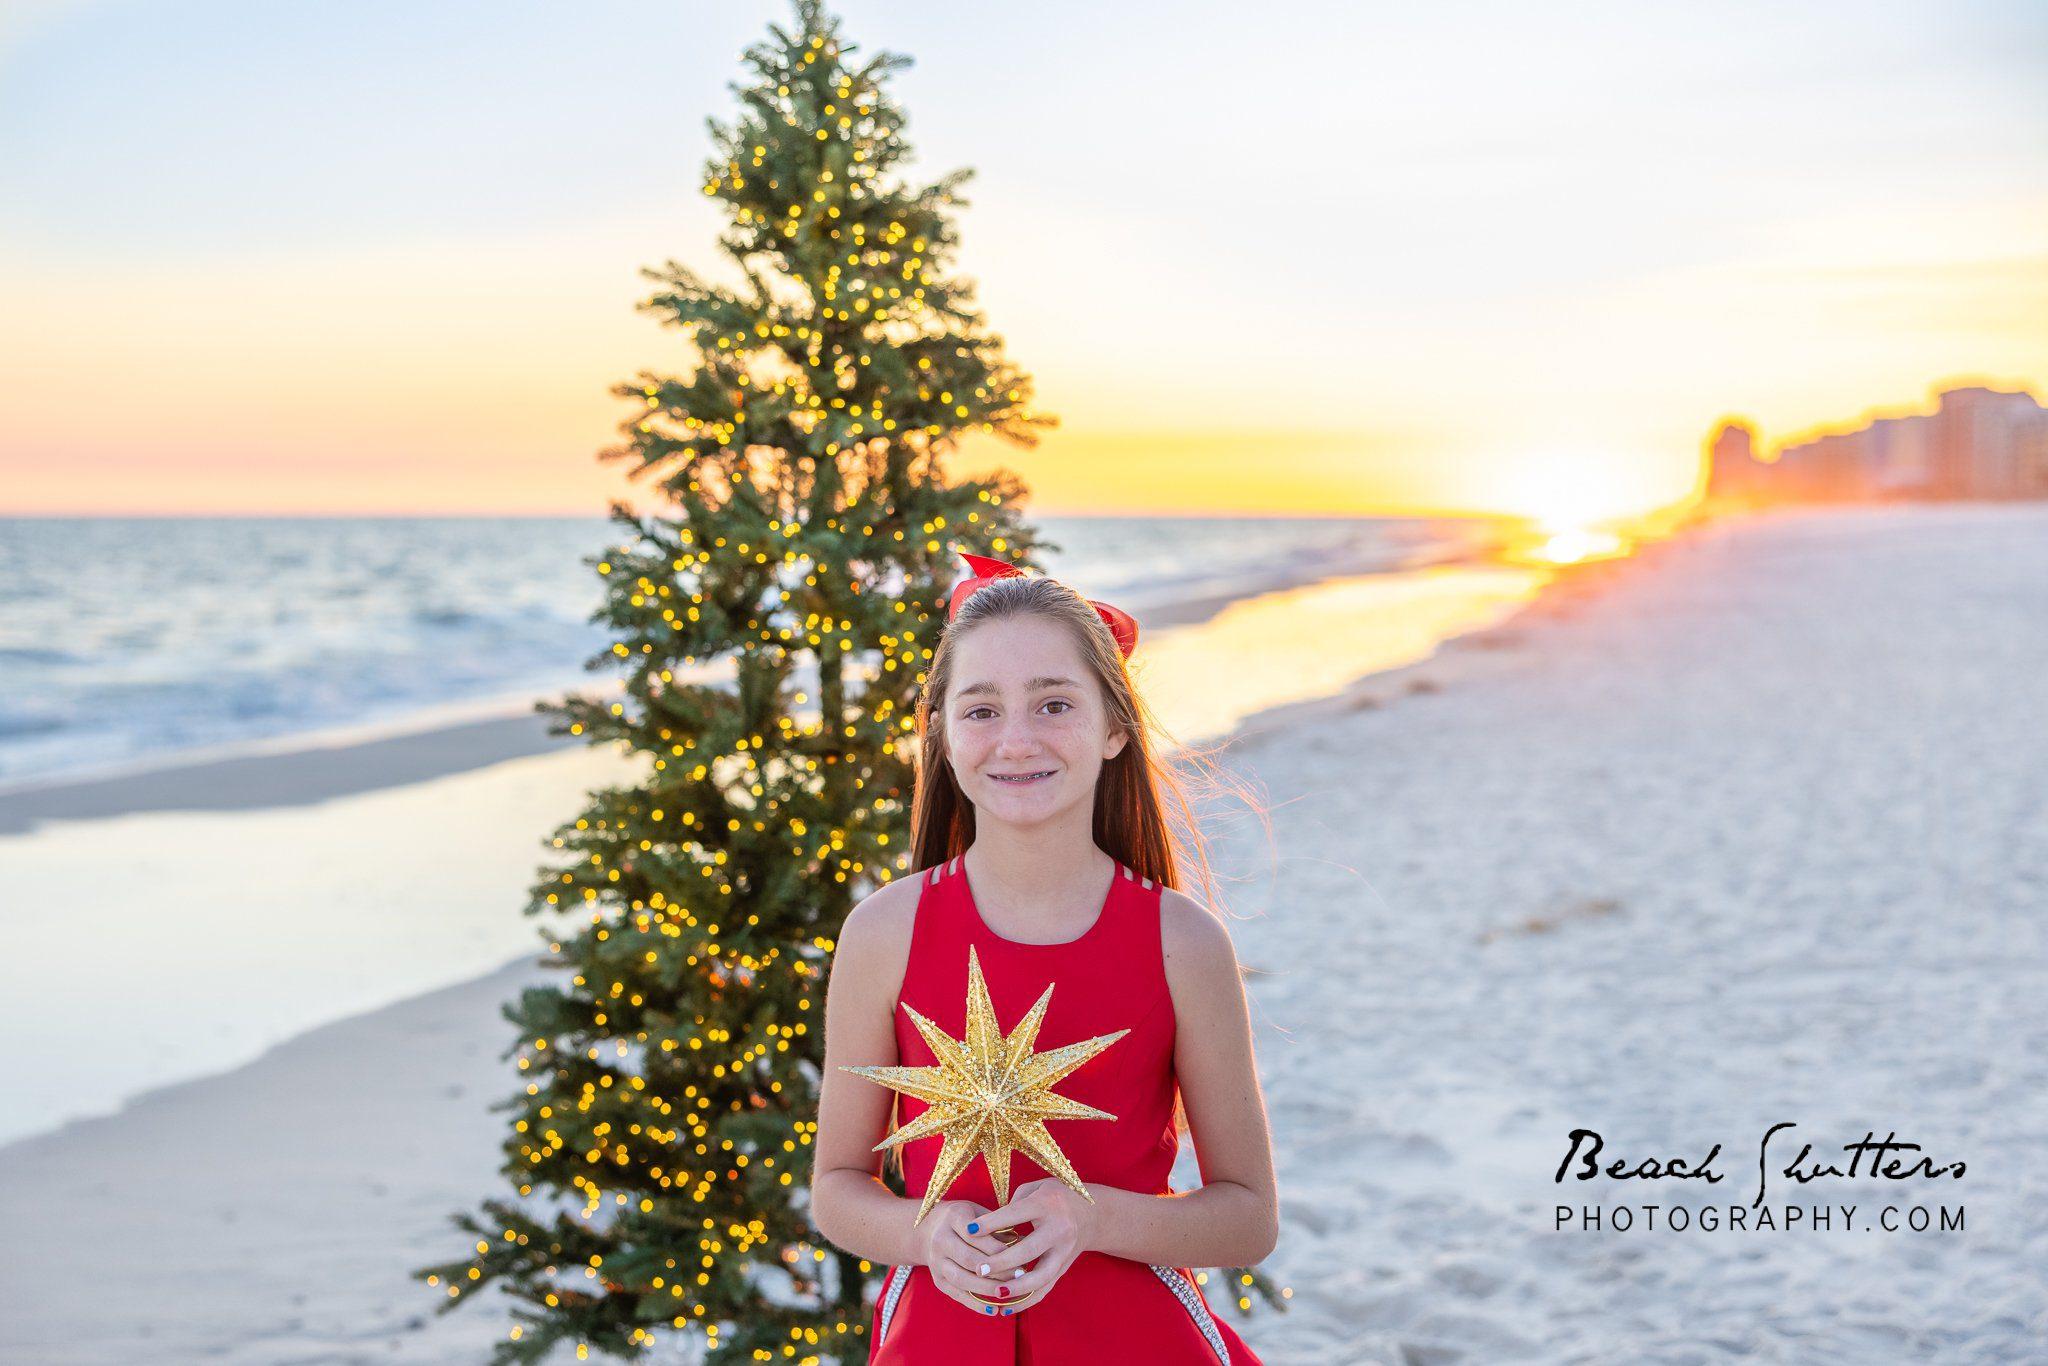 beach photographers Christmas tree